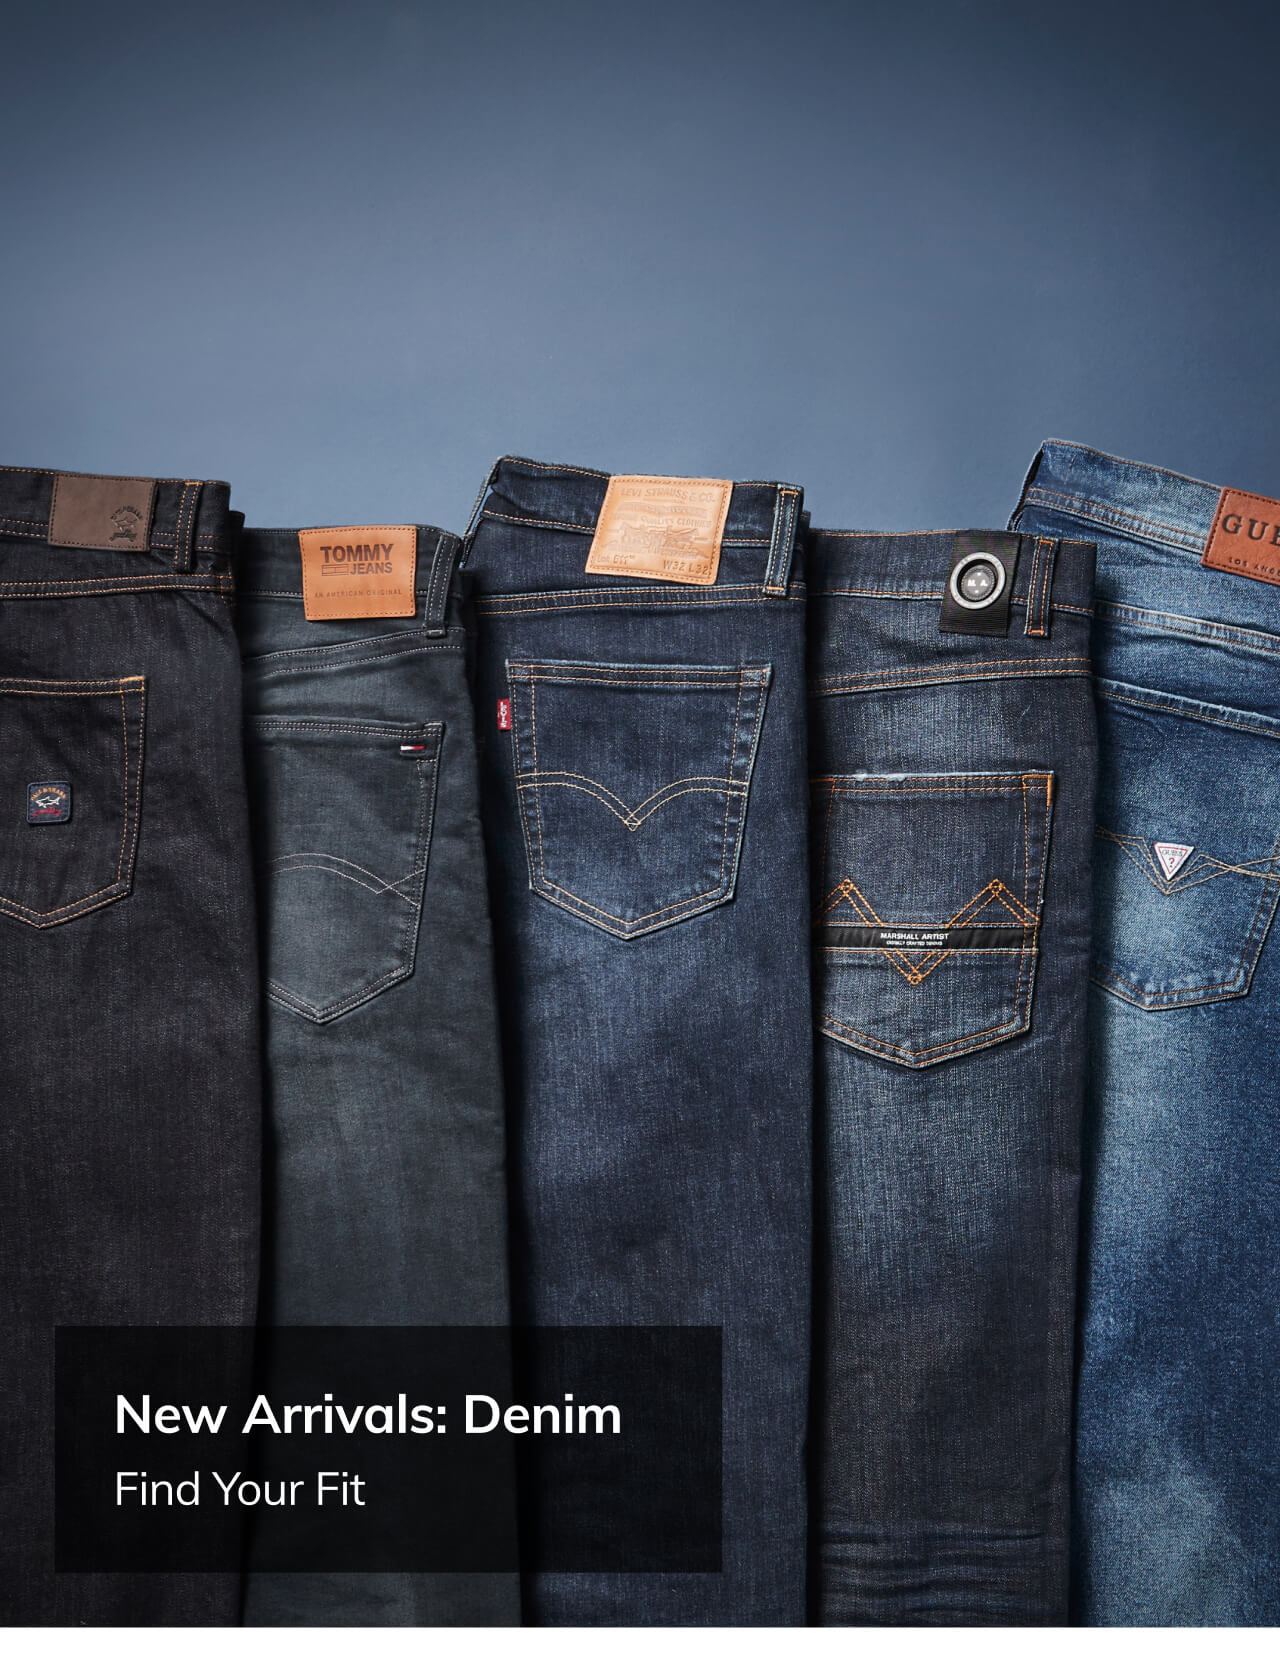 New Arrivals: Denim